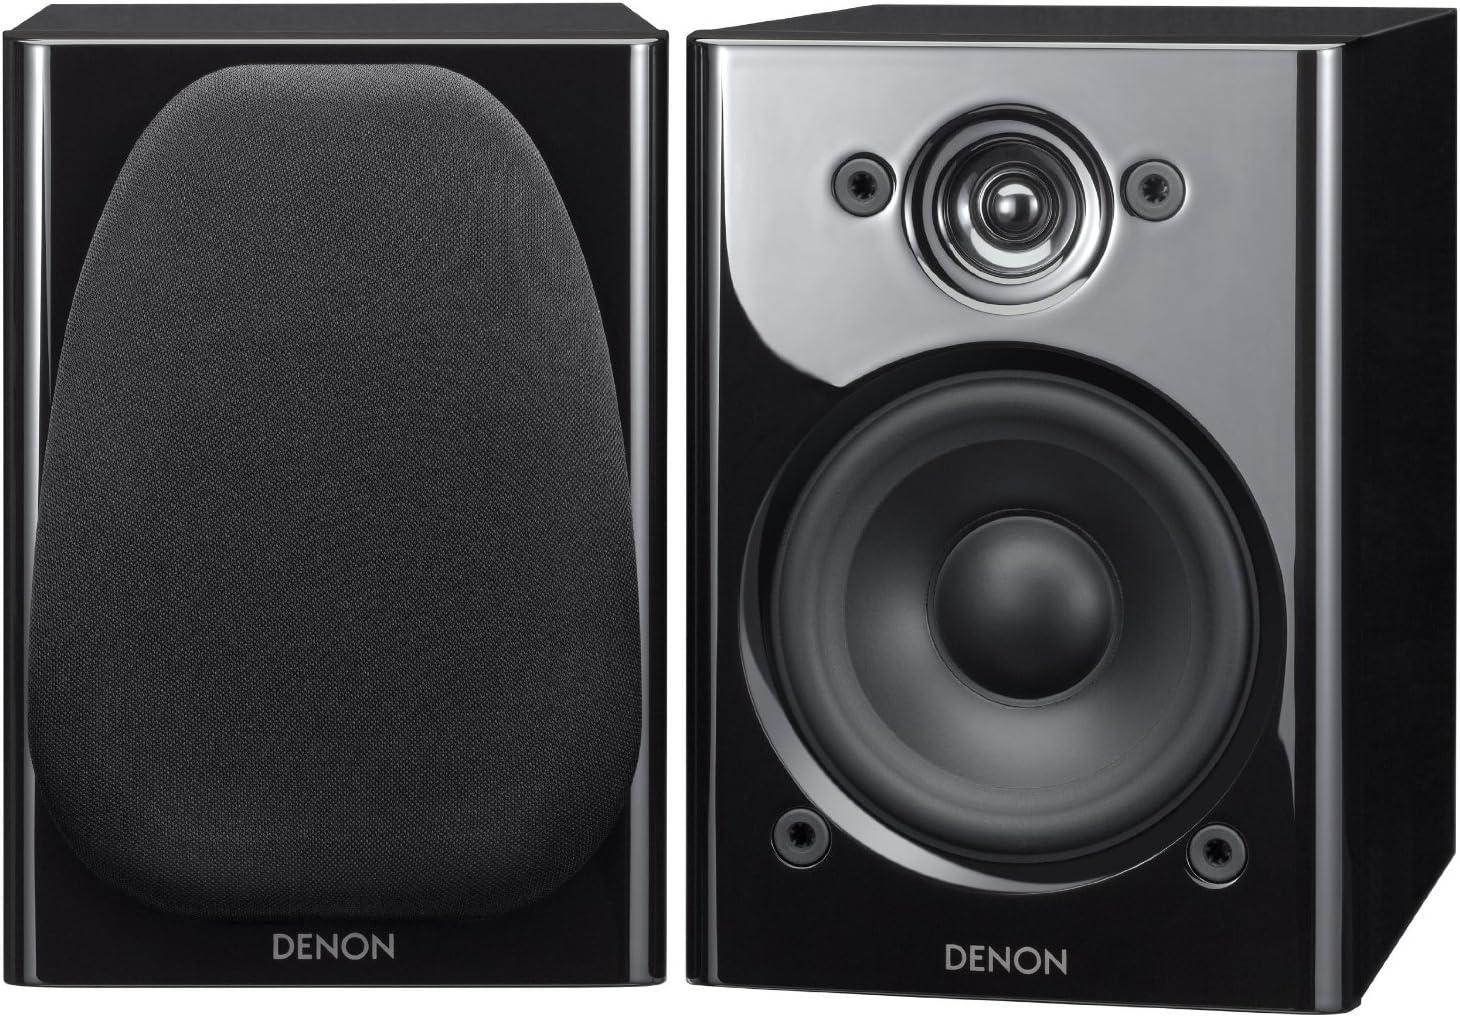 10 Stücke 60 Watt 2 Wege Crossover Filter Zwei Lautsprecher System Audio gg